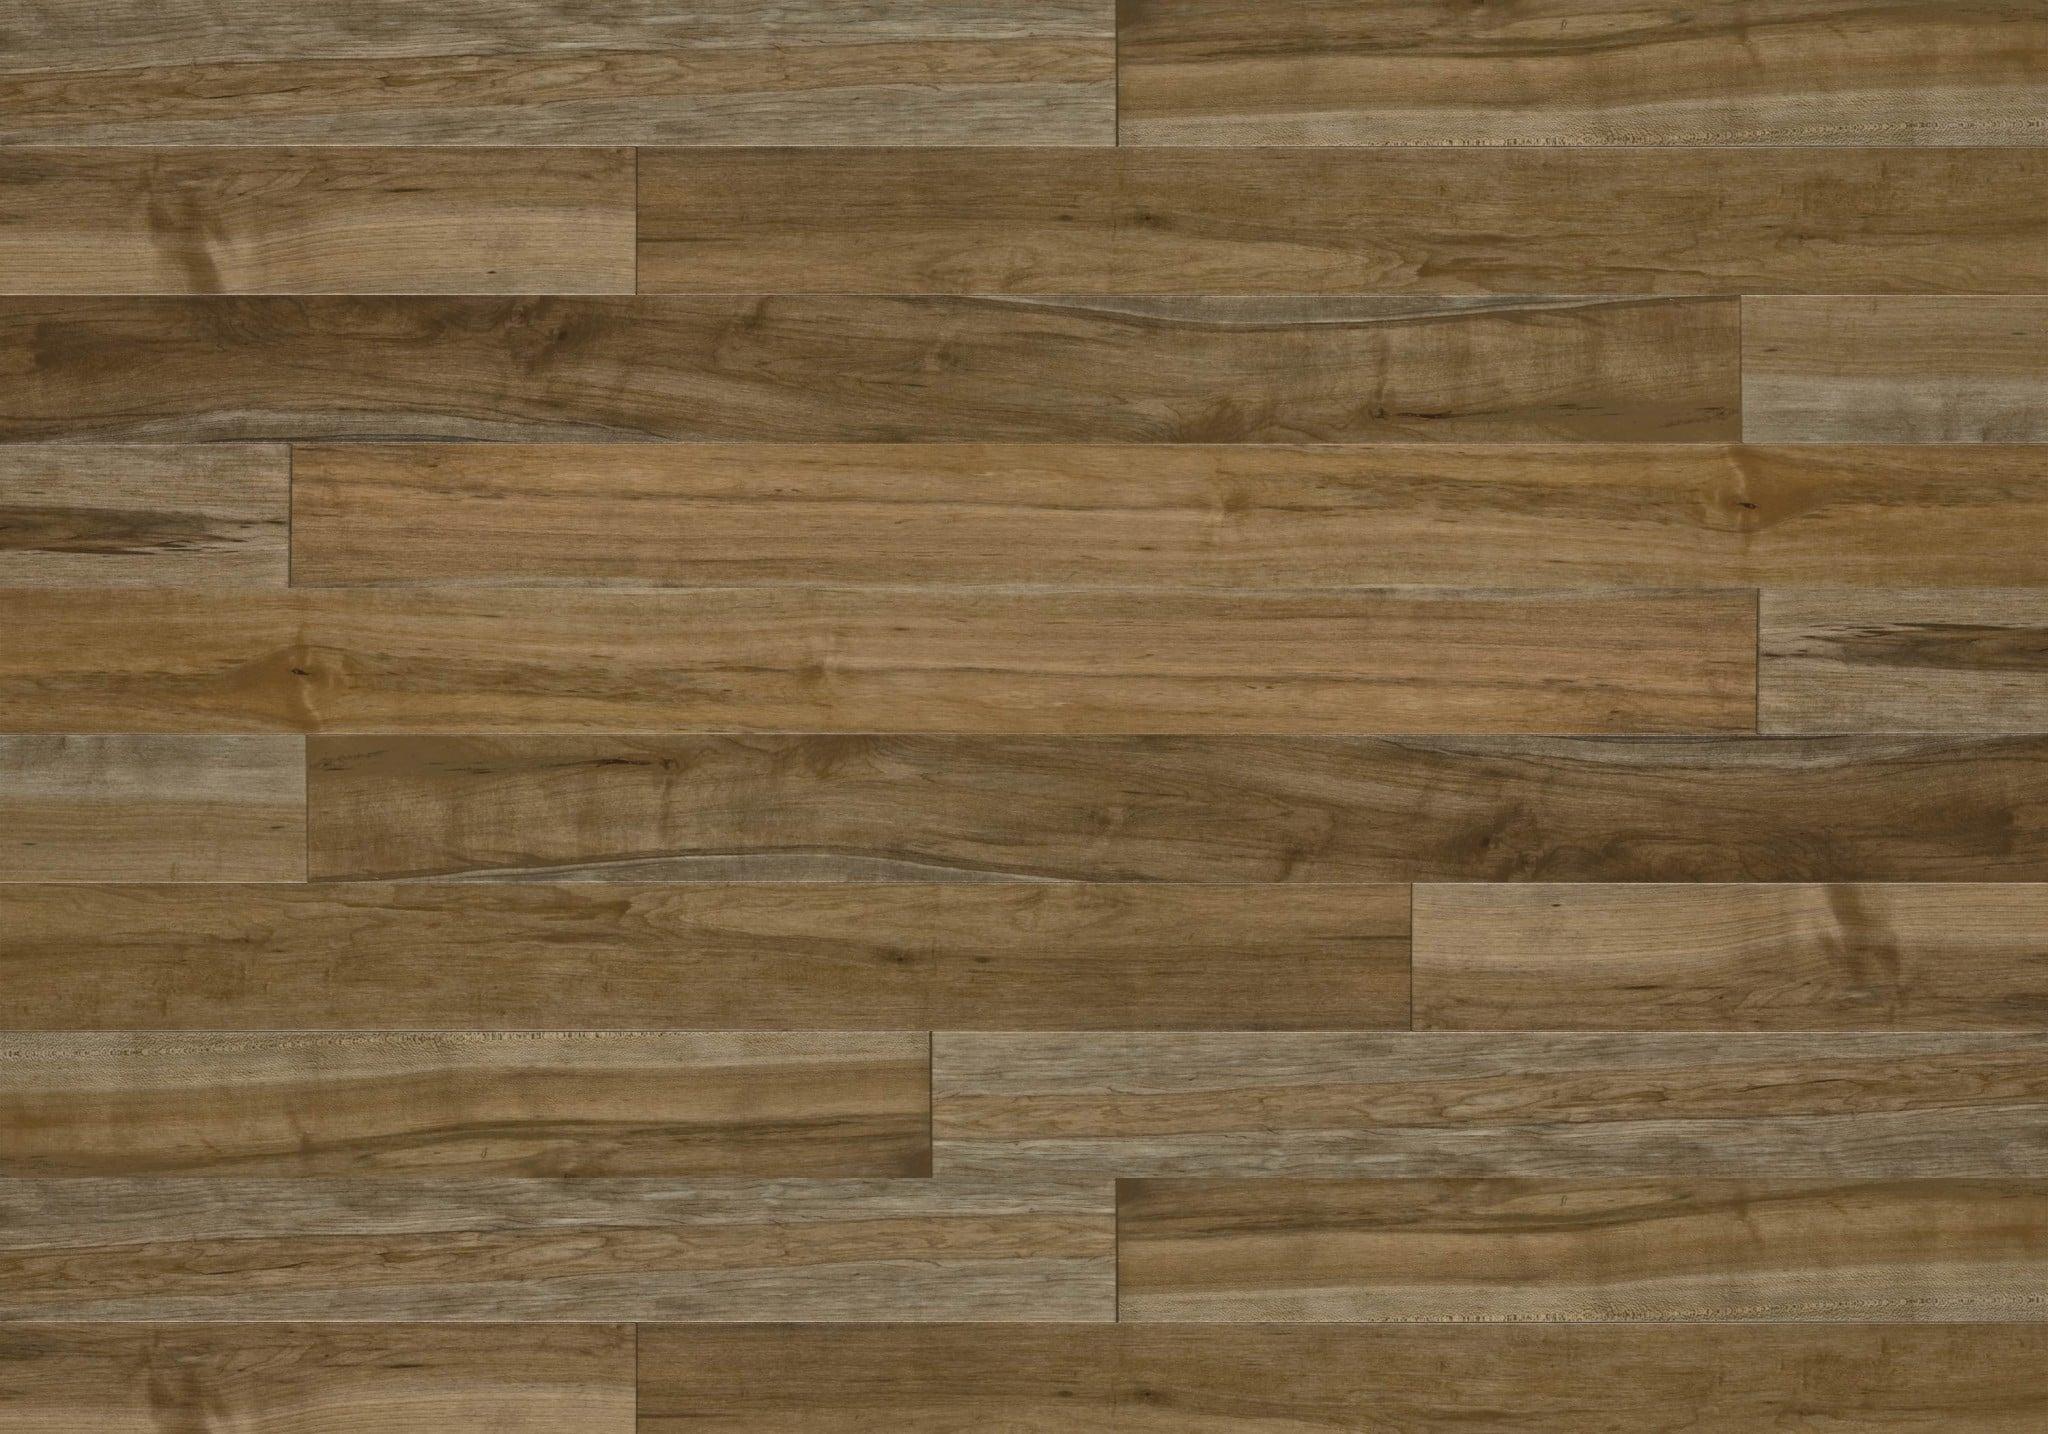 Lauzon designer collection organik series hard maple for Hard hardwood flooring